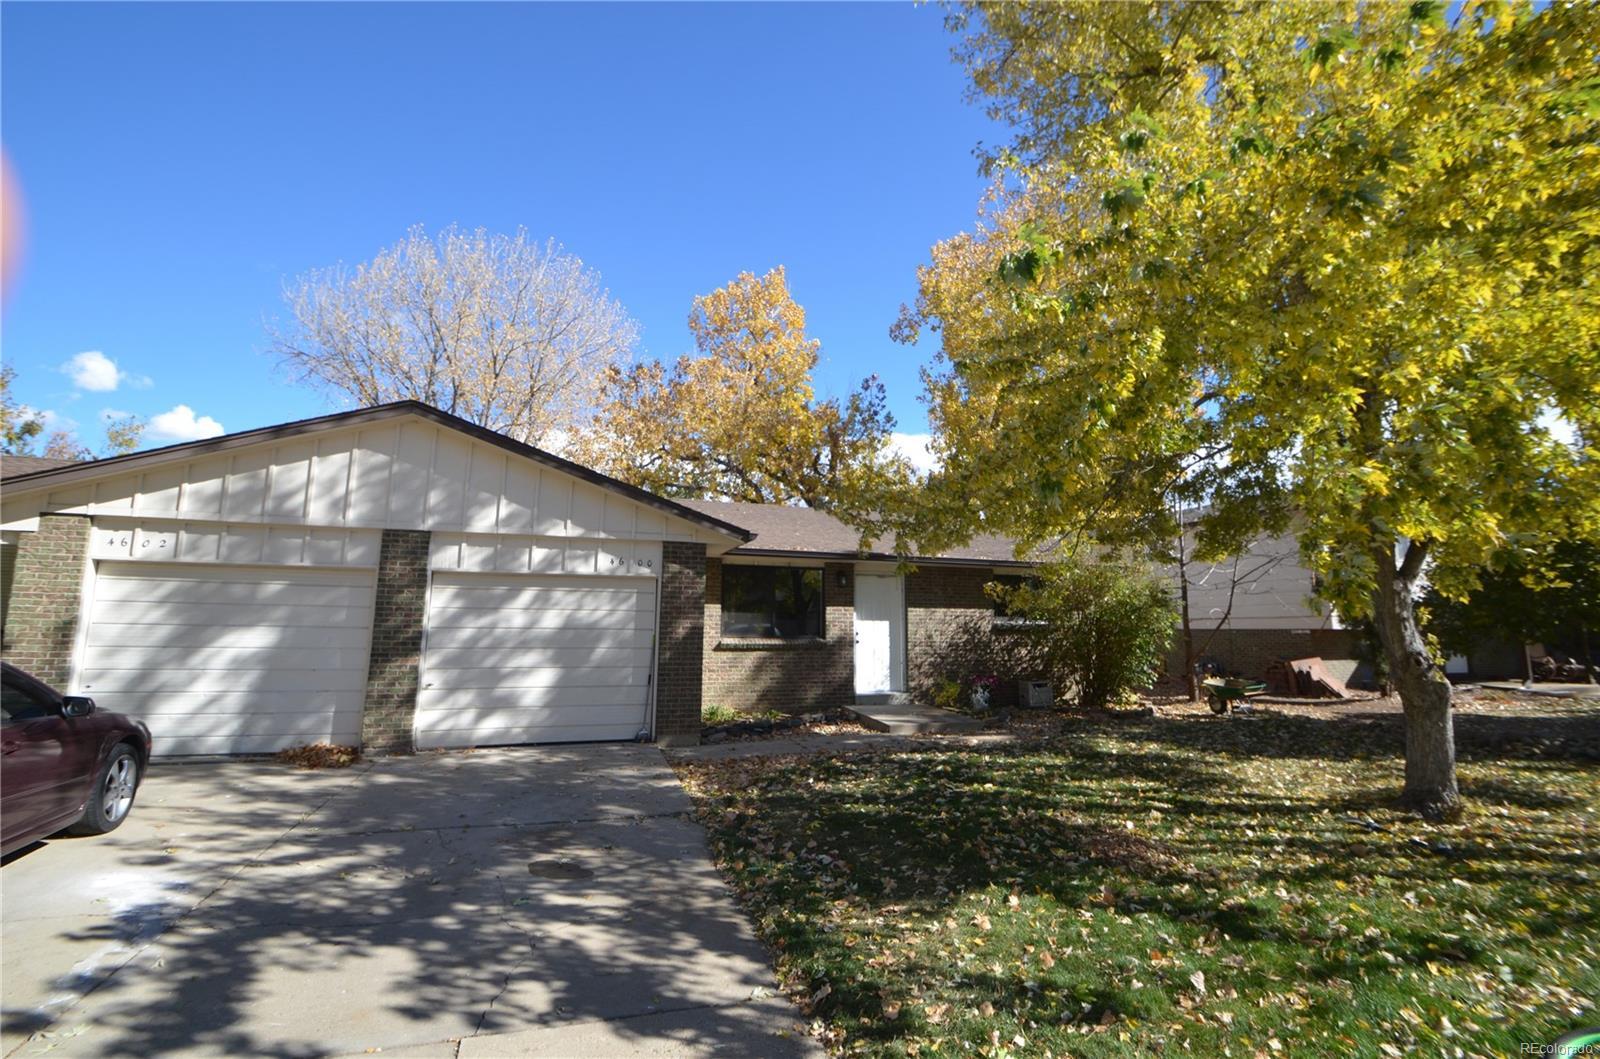 4600 Simms Street, Wheat Ridge, CO 80033 - Wheat Ridge, CO real estate listing